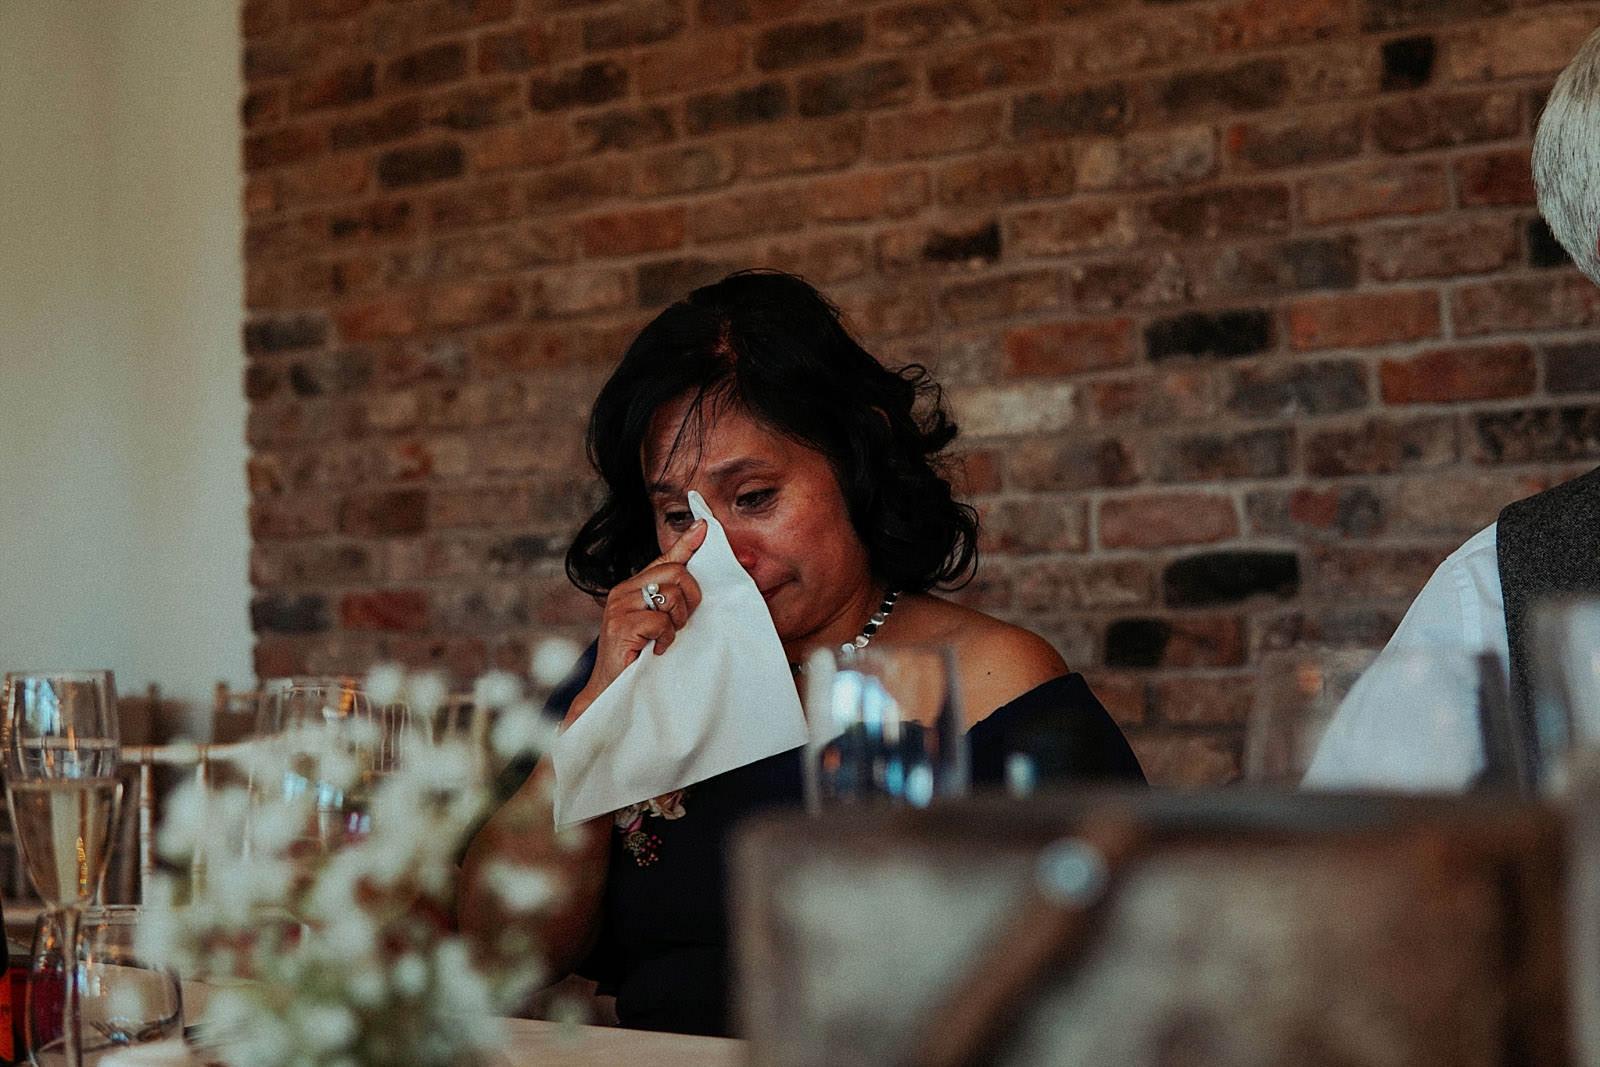 mum using napkin to wipe away tears